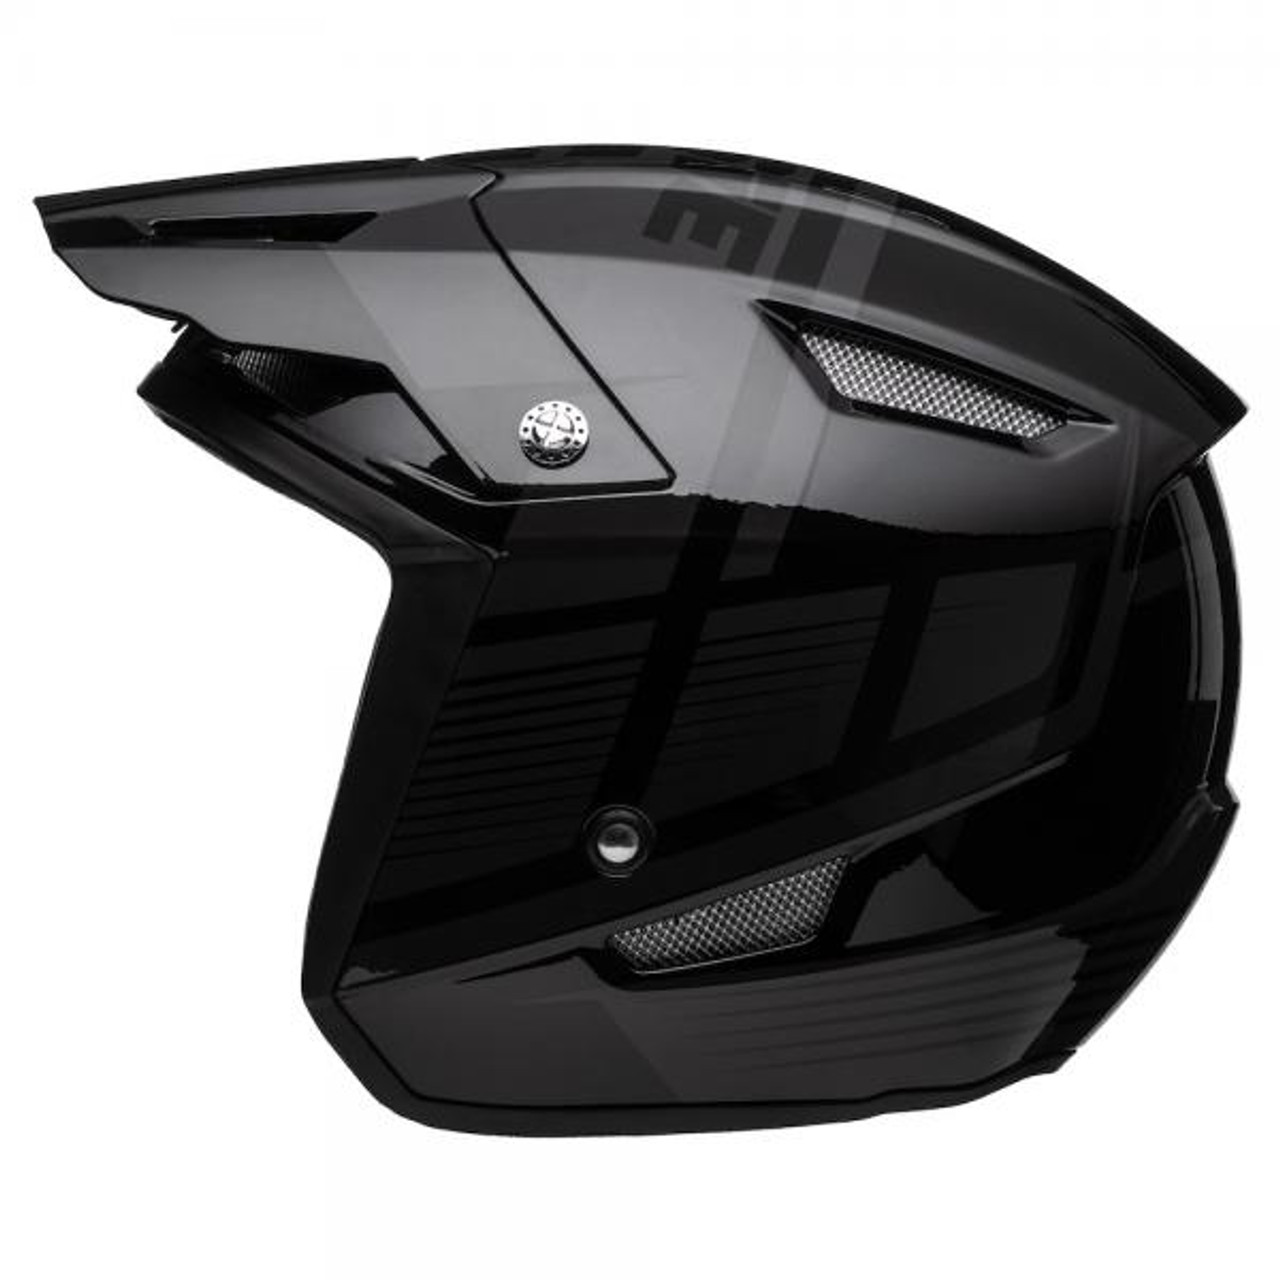 Helmet HT1 Struktur, black/ grey